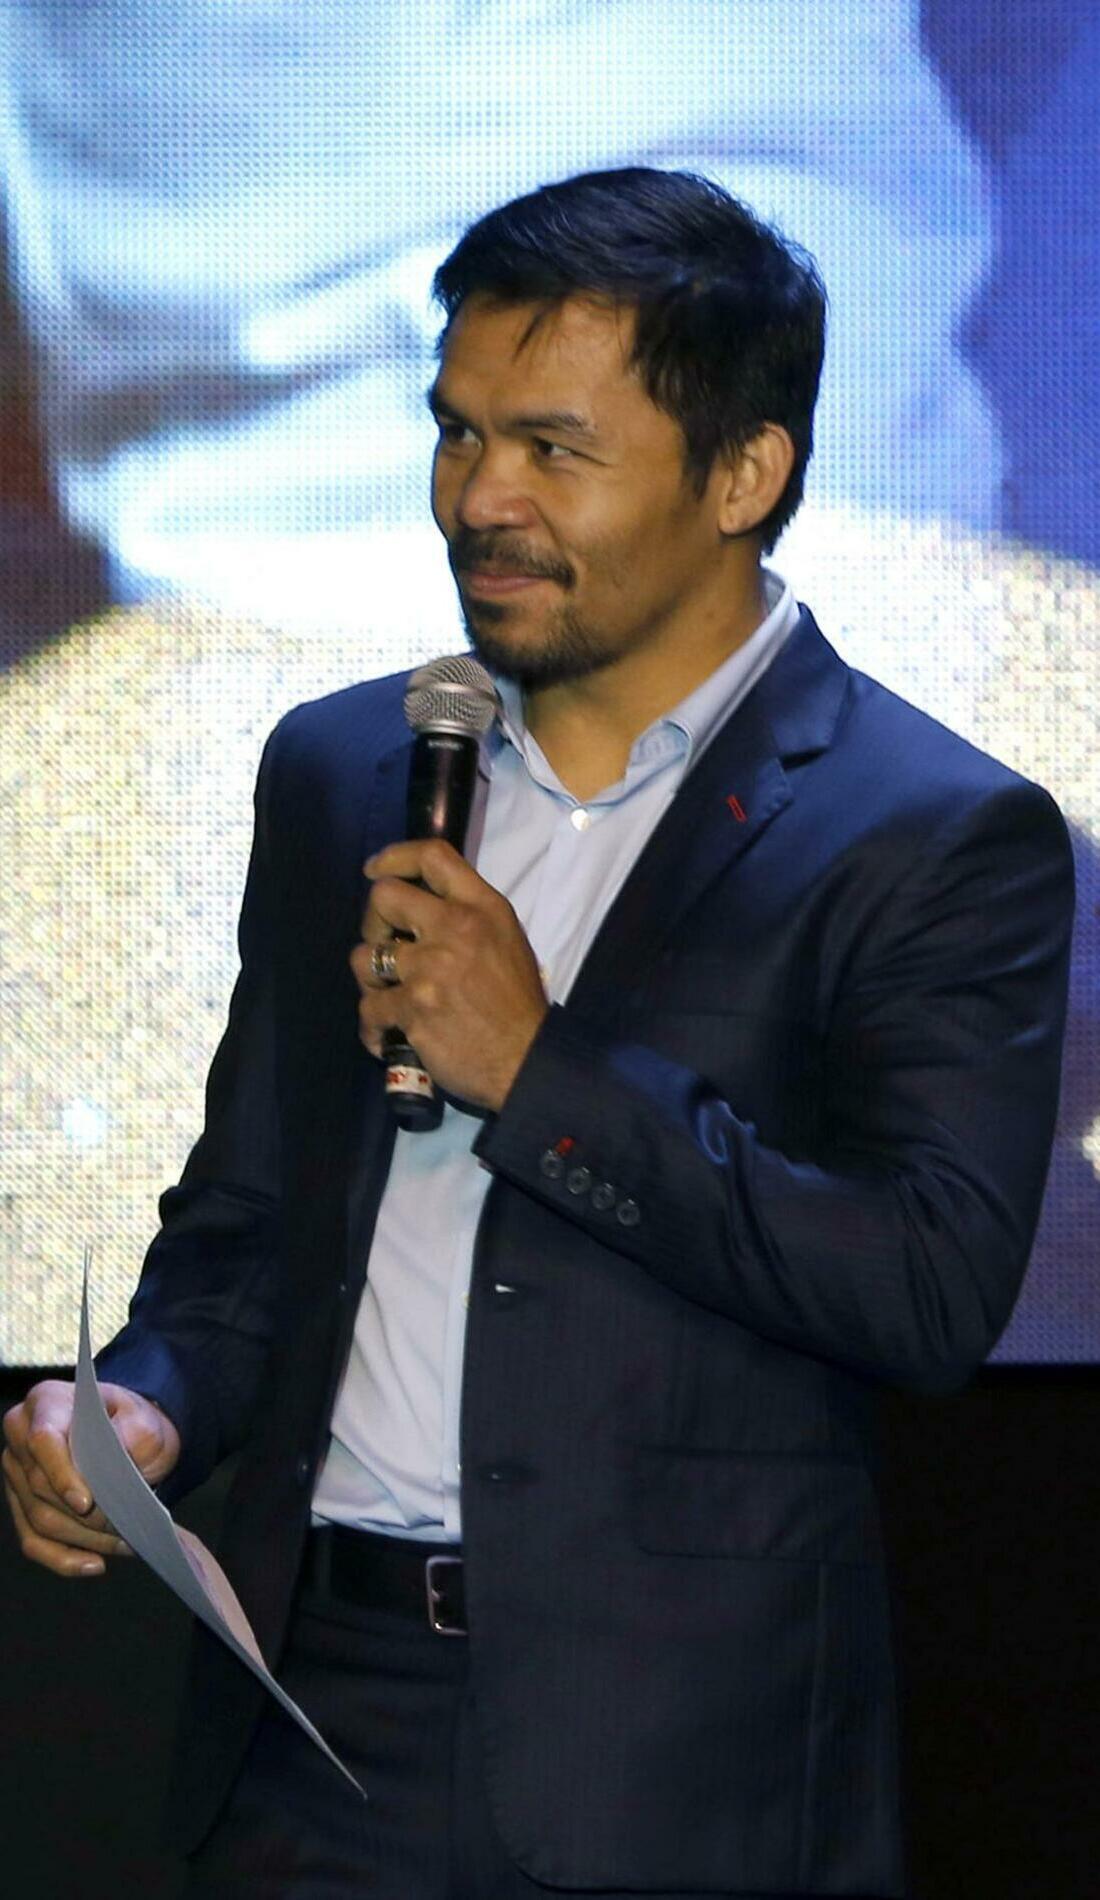 A Manny Pacquiao live event